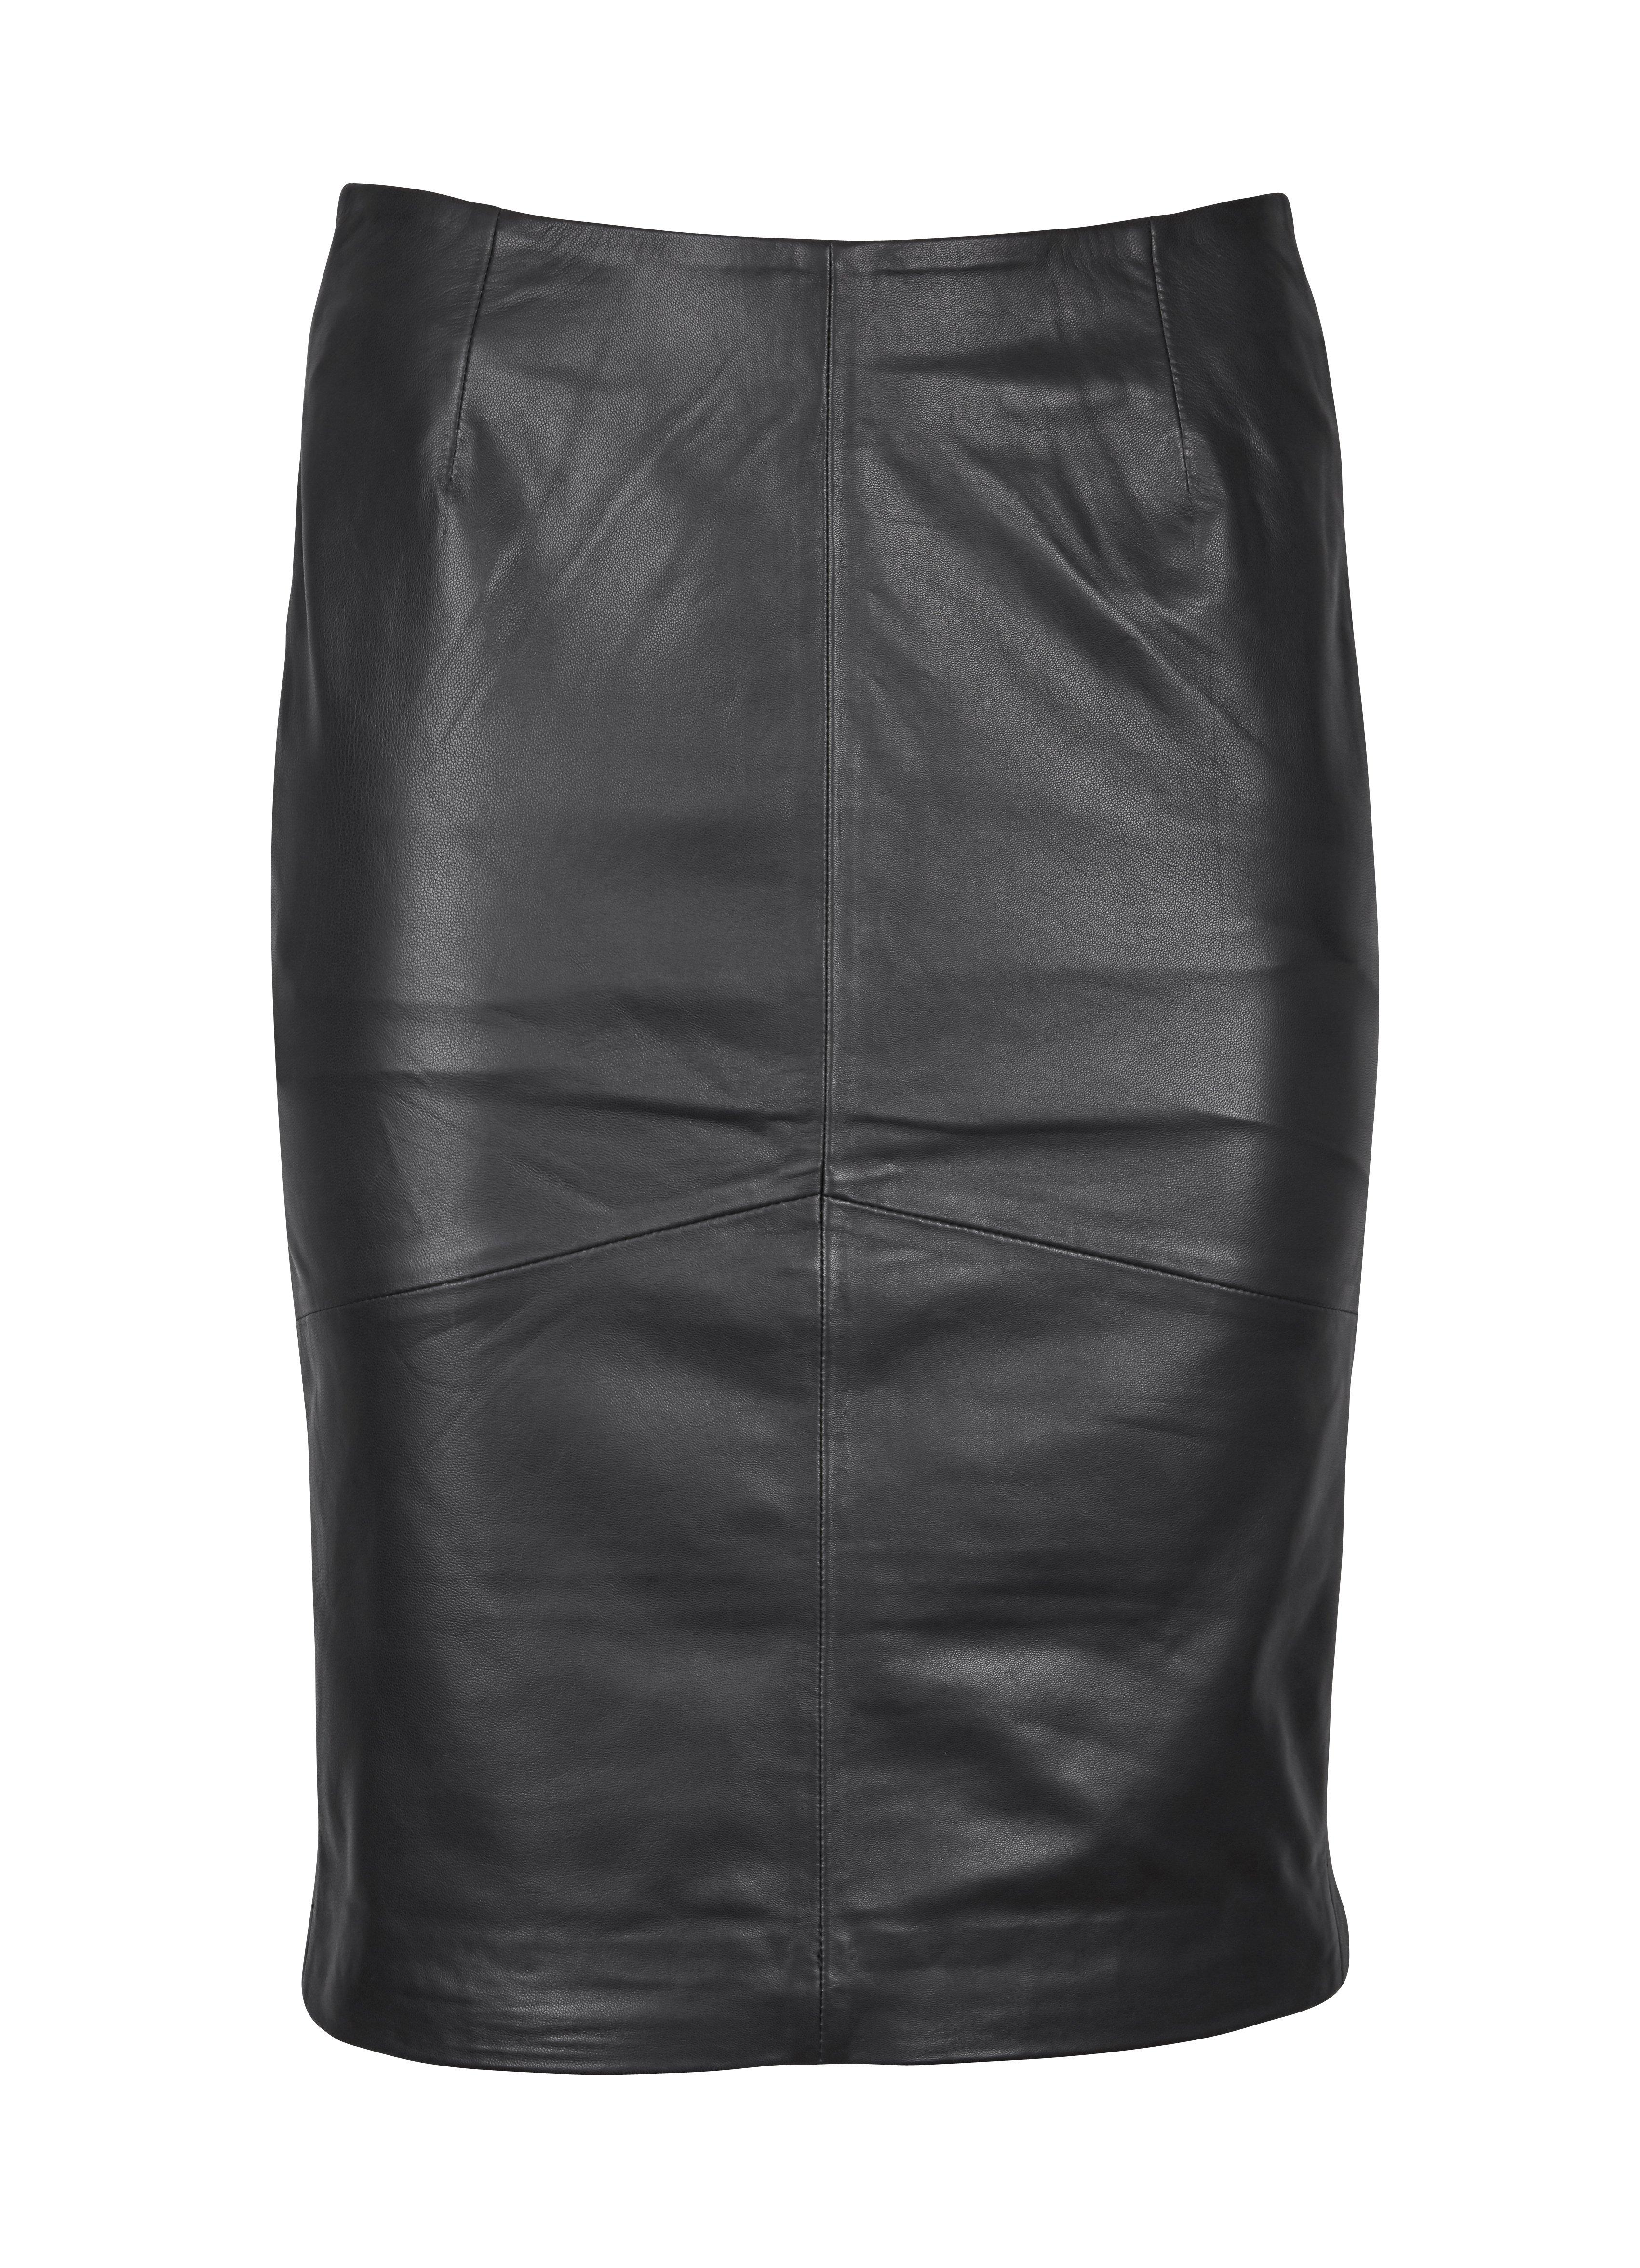 ee90ea067d Trouva: Alvina Leather Skirt